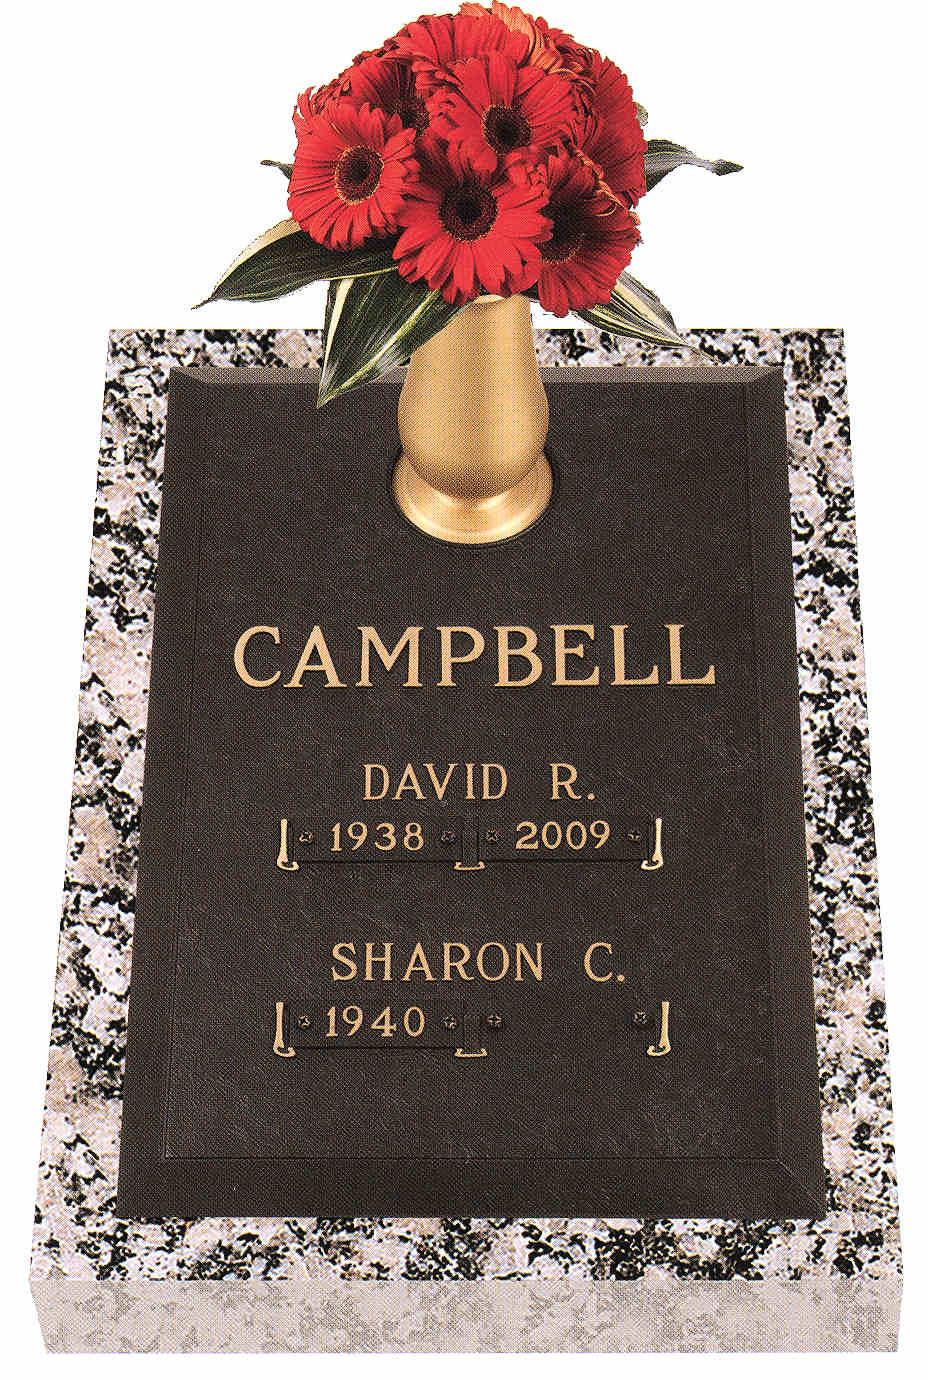 Double Interment Grave Marker Designs Cemetery Monument